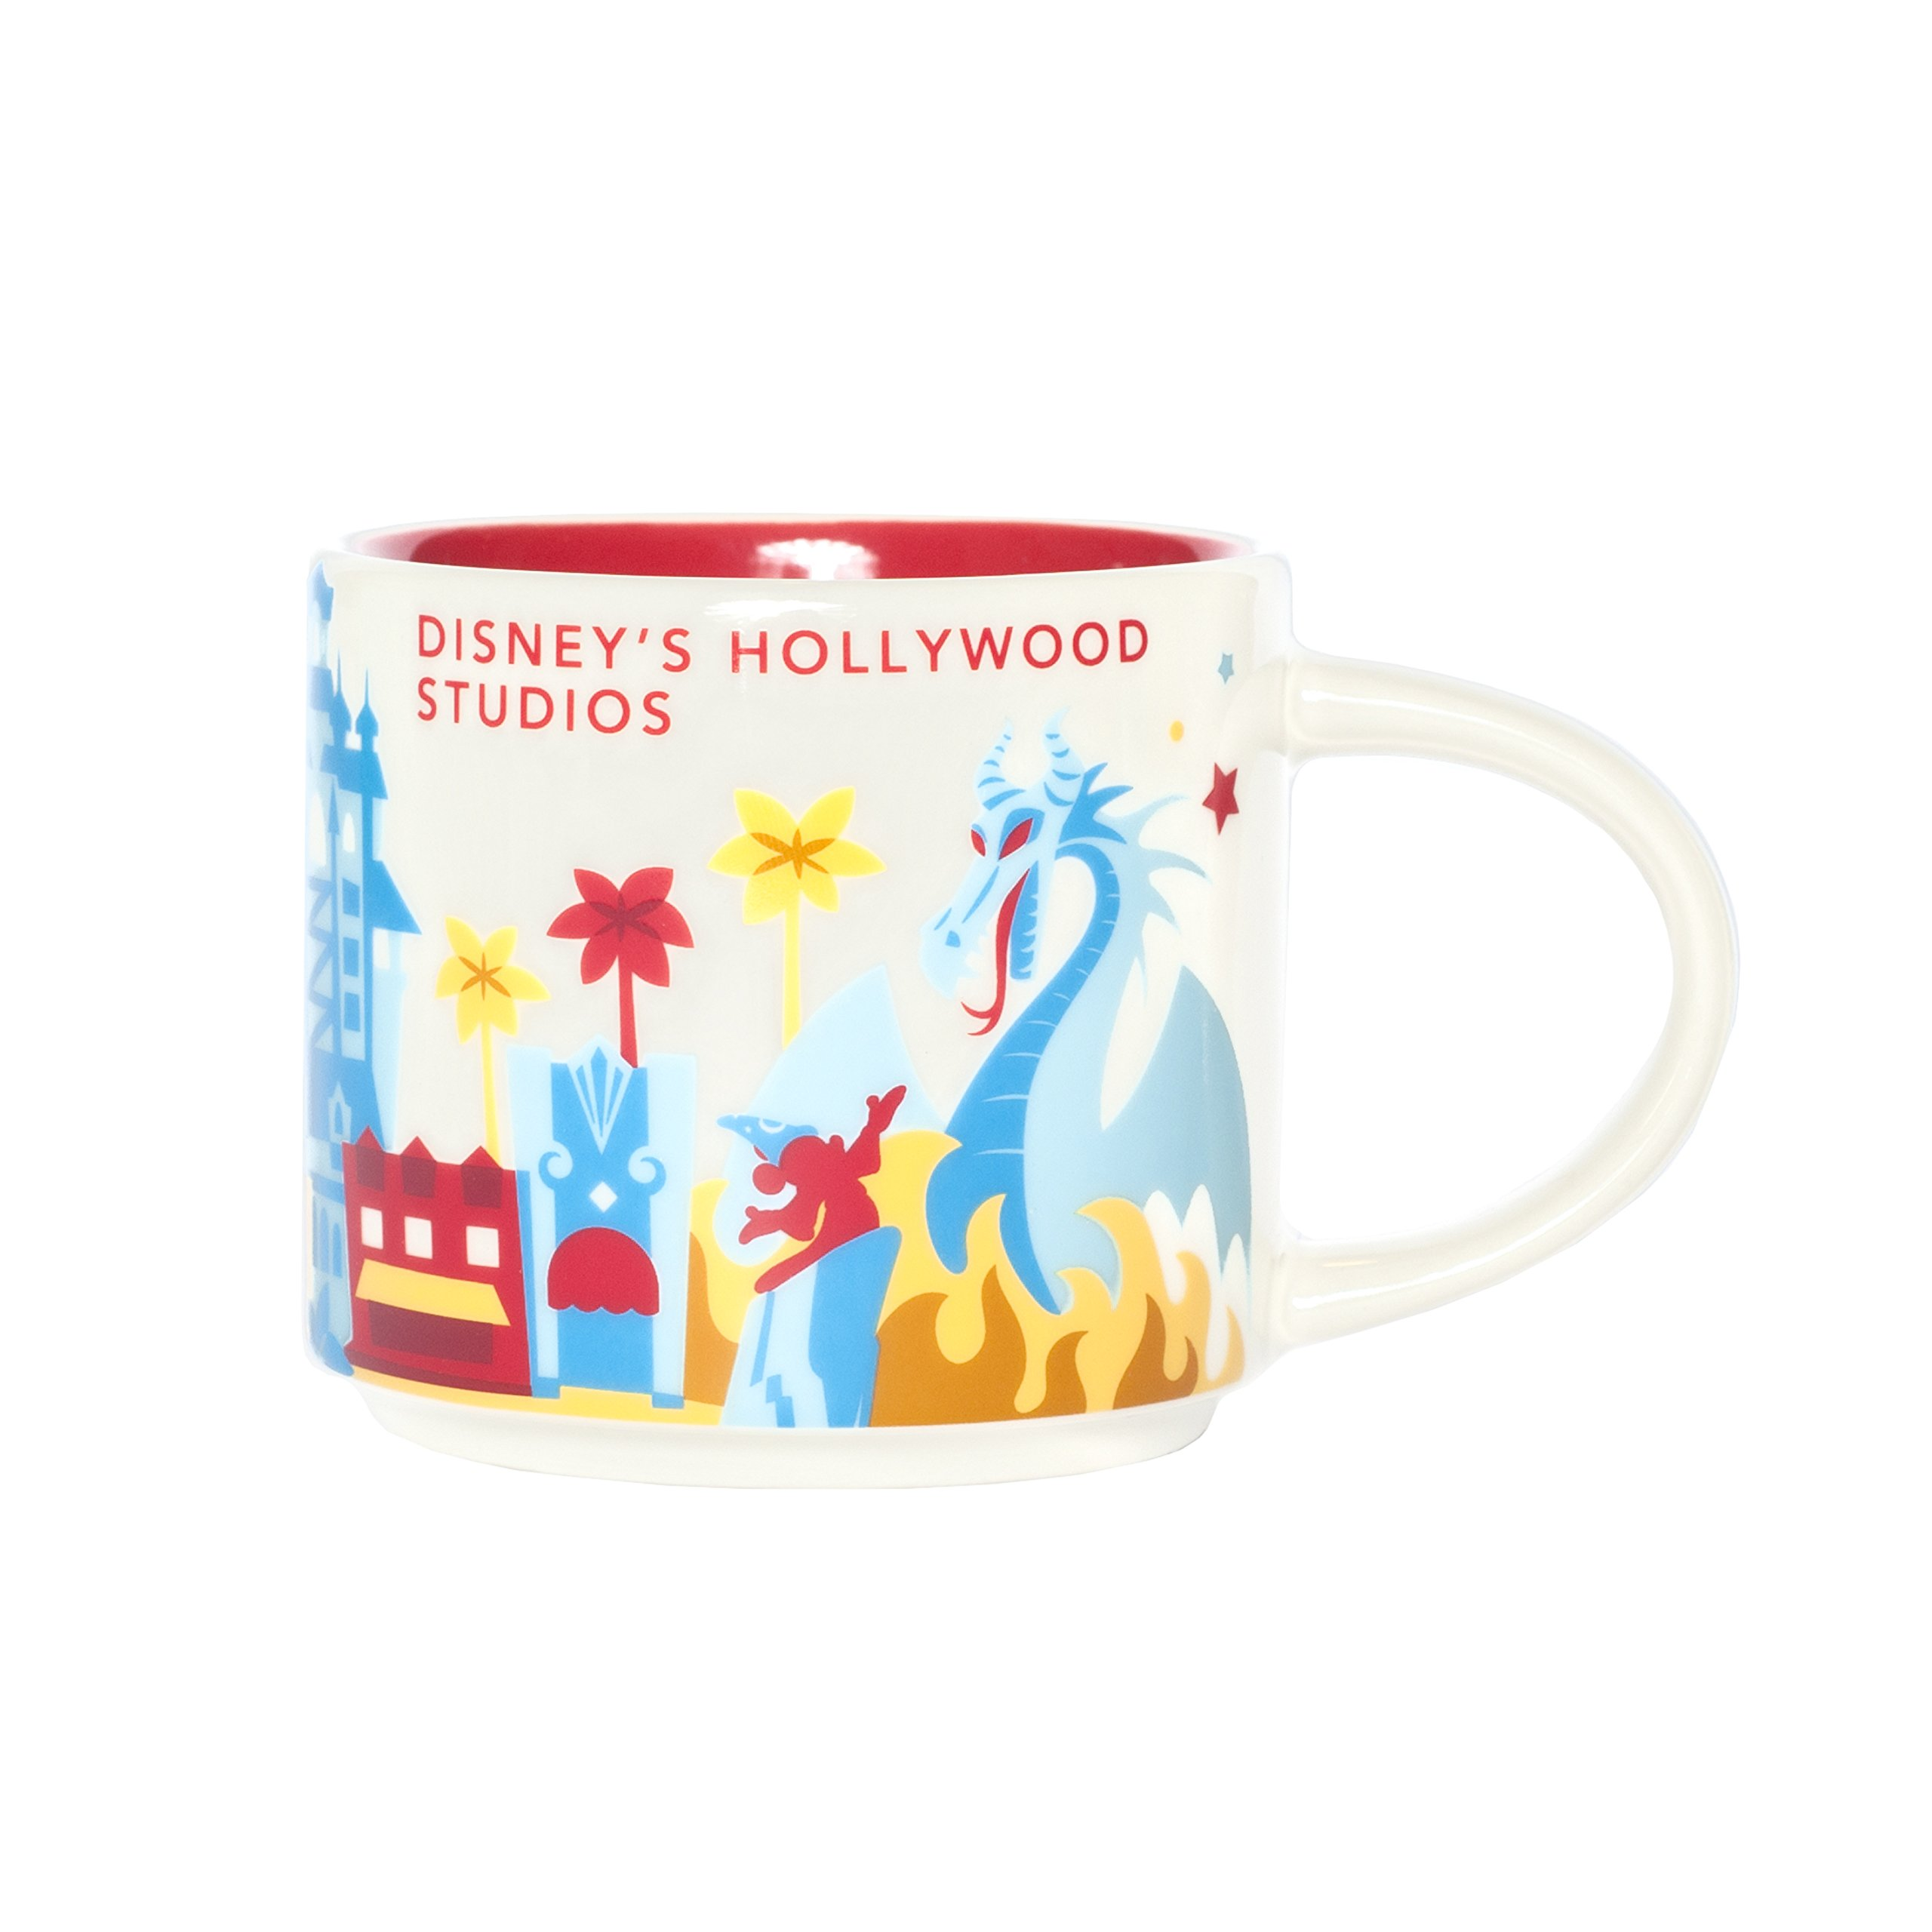 Starbucks You Are Here Disneys Hollywood Studios Disney Parks Version 2 (2017) 14oz Mug